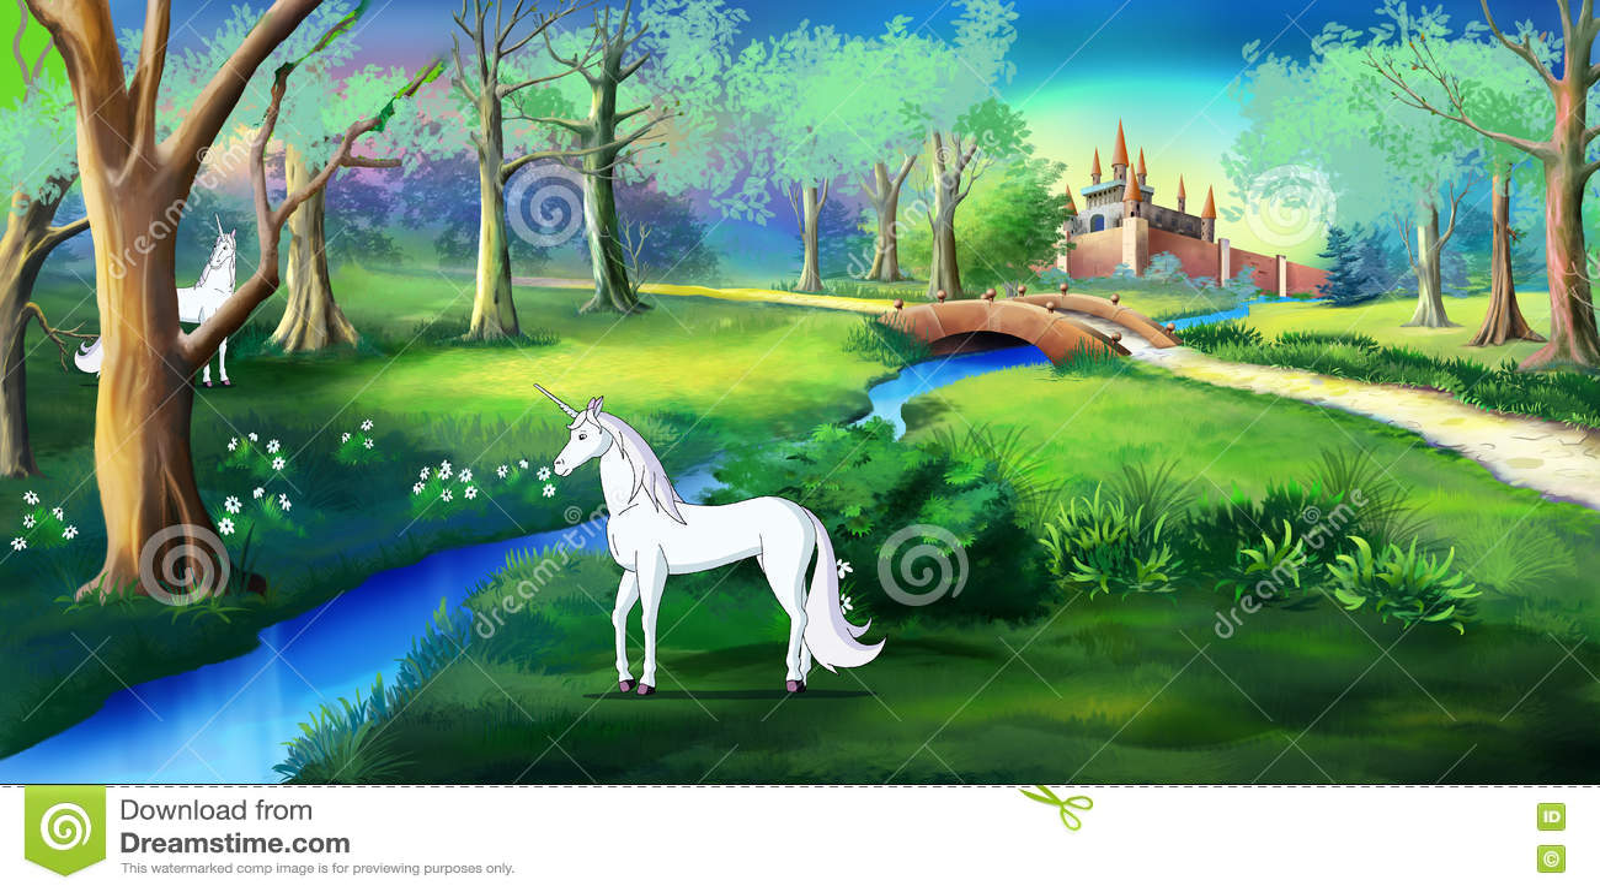 White Unicorn in a Magic Forest Near a Fairy Tale Castle